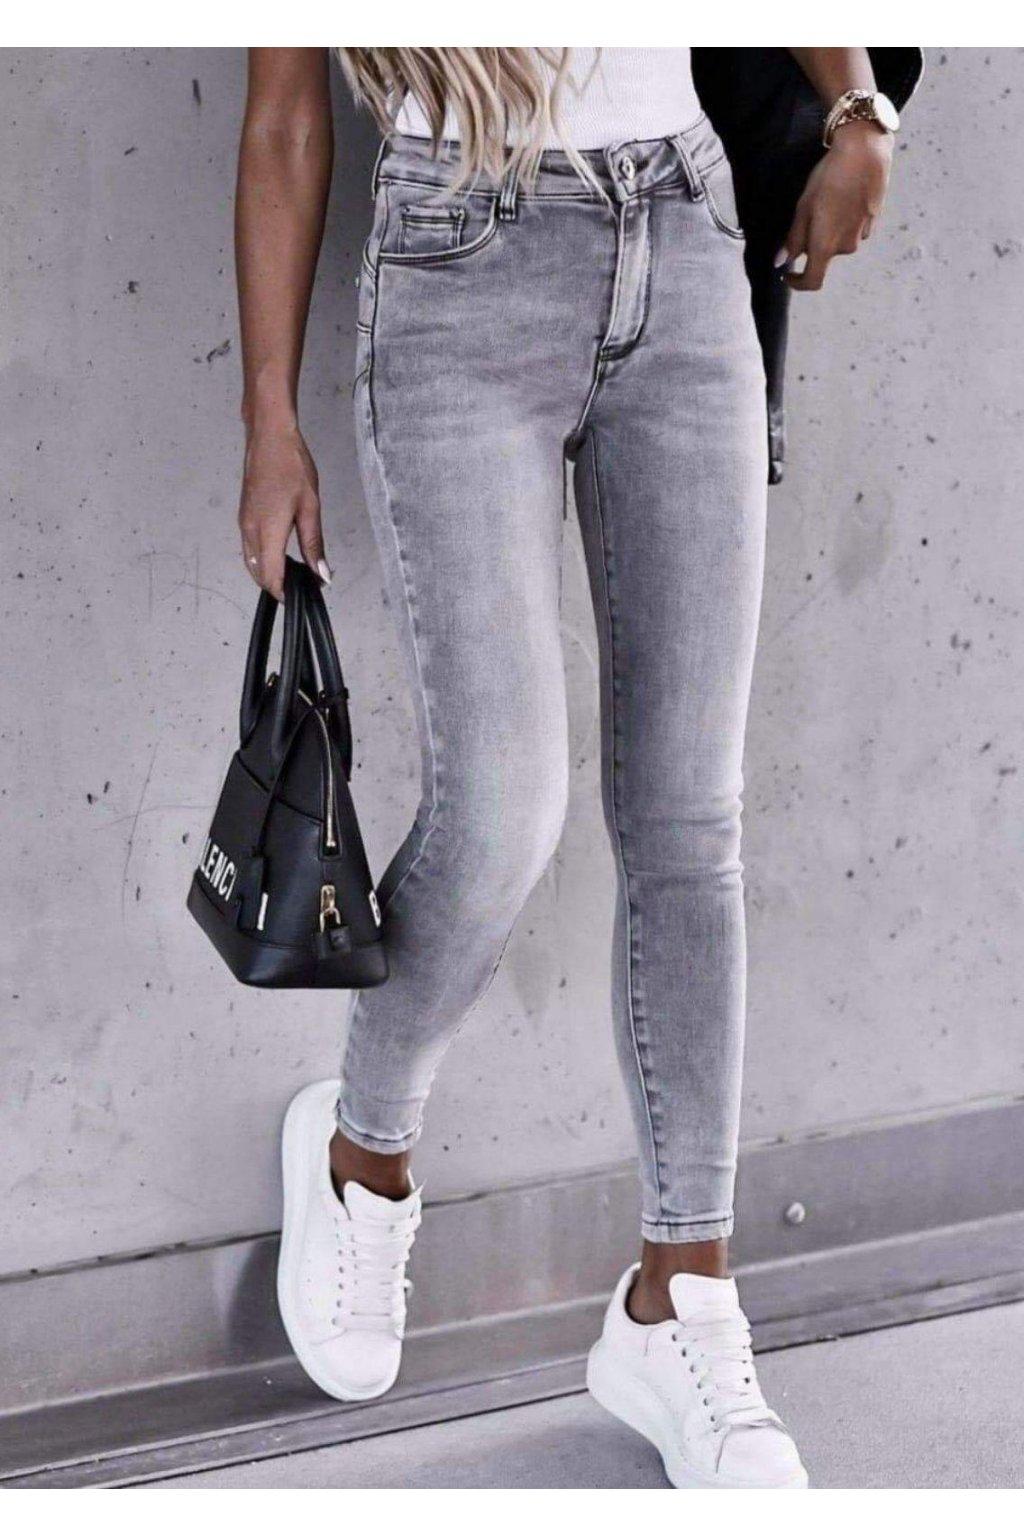 jeans šedé elastické trendy EAZY